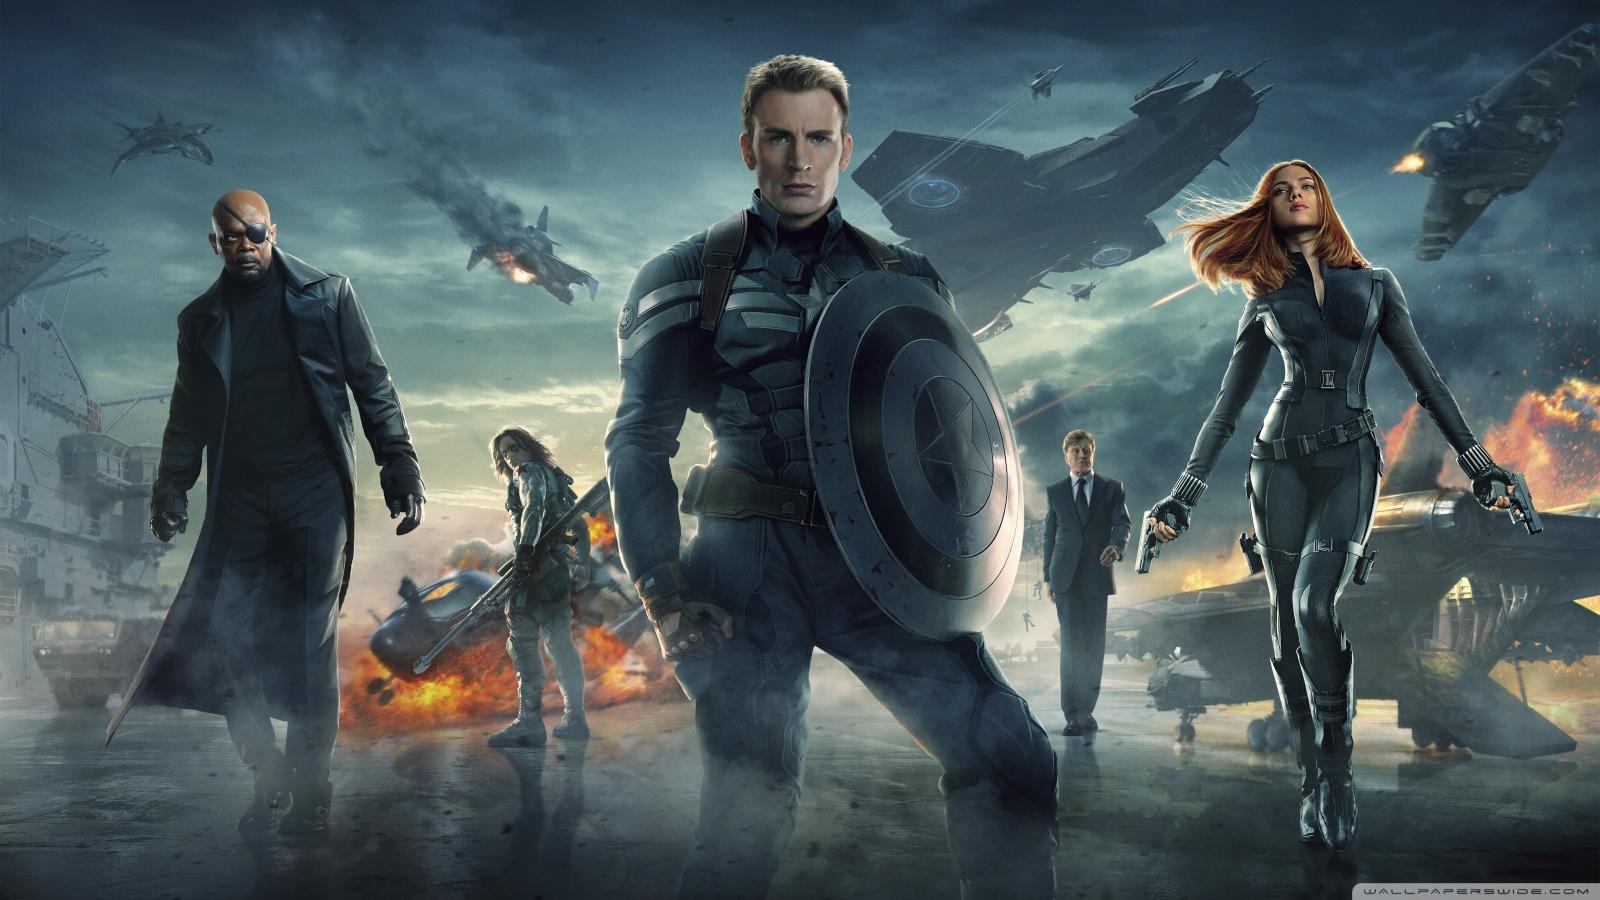 Captain America Winter Soldier Wallpaper 1920x1080 1 1600x900